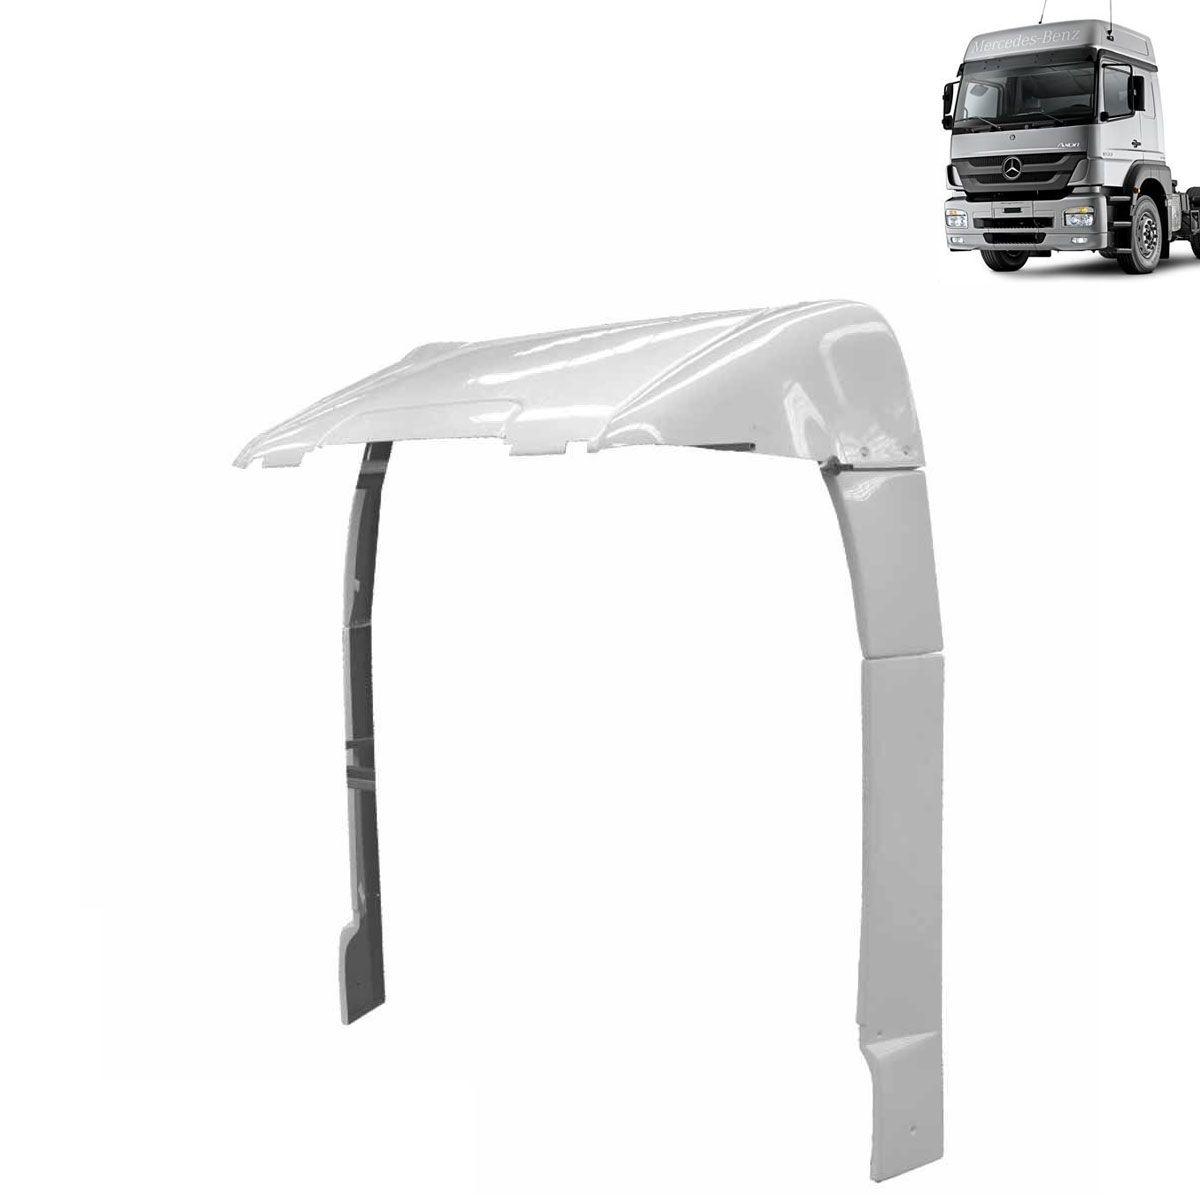 Defletor de Ar para Mercedes Benz Axor Cabine Alta Completo